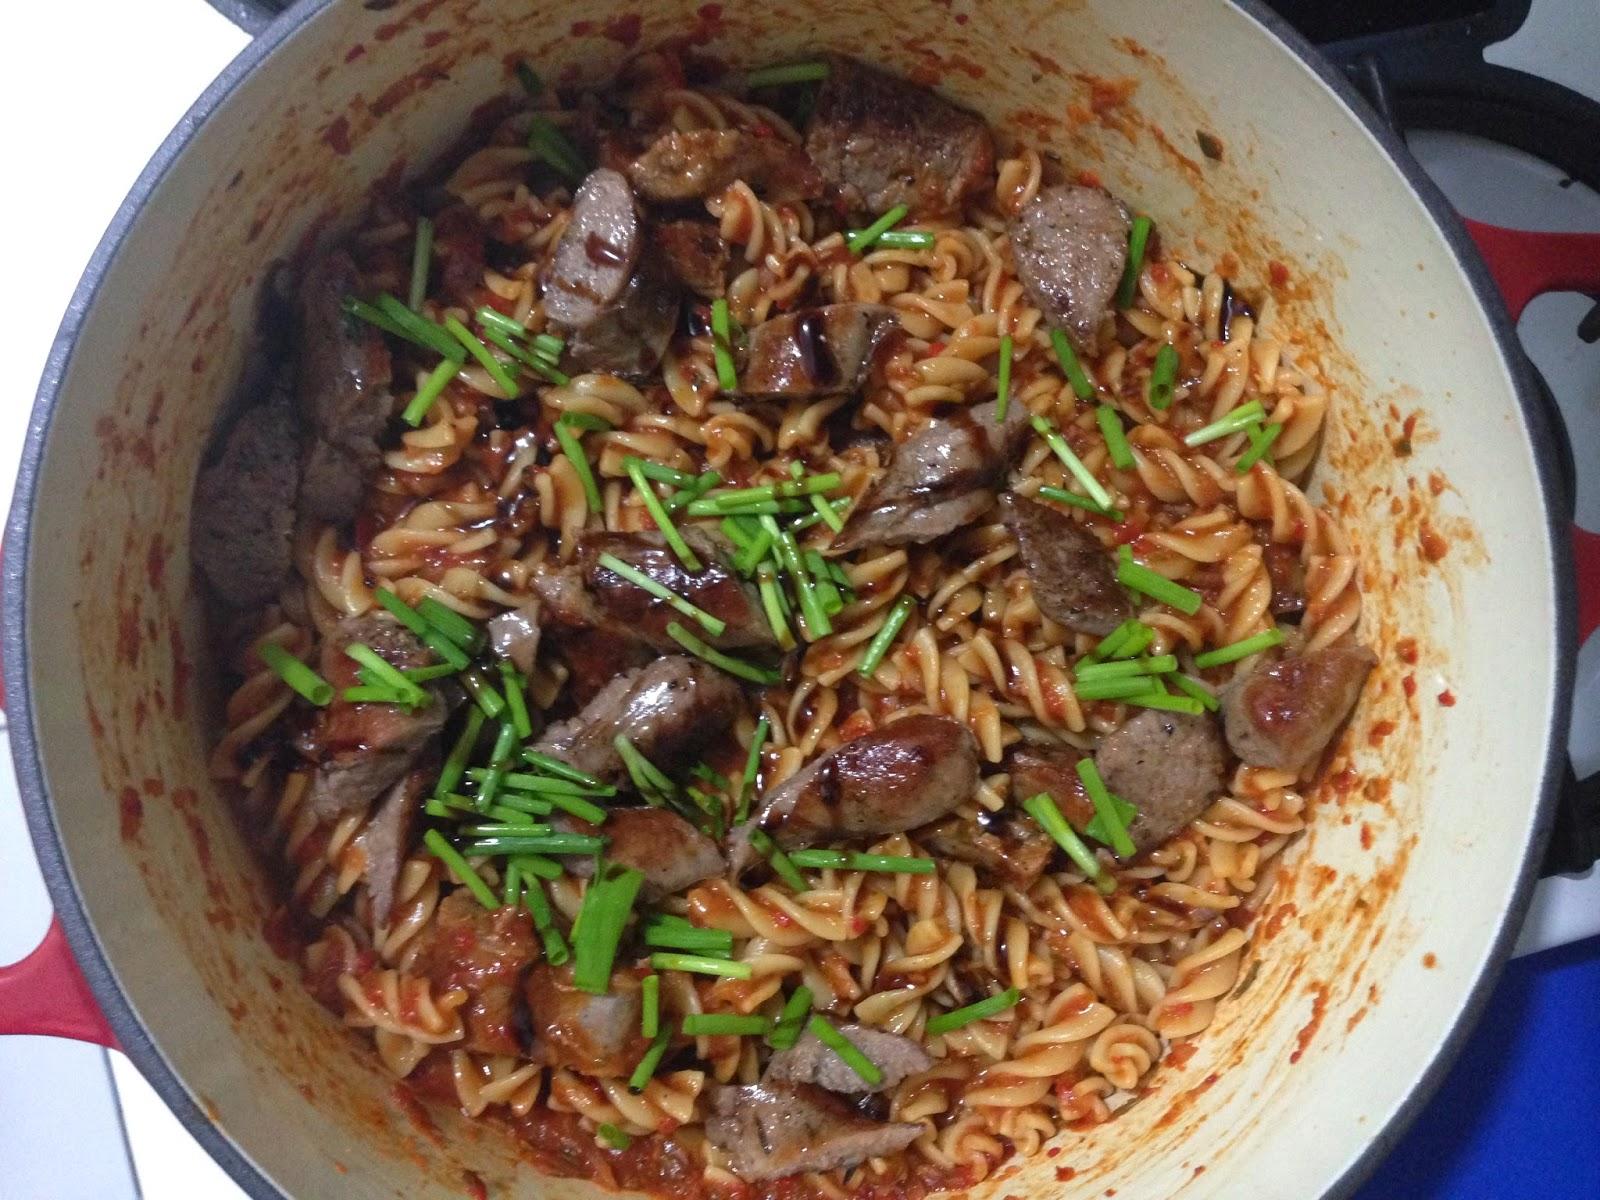 jamie oliver 15 minute meals